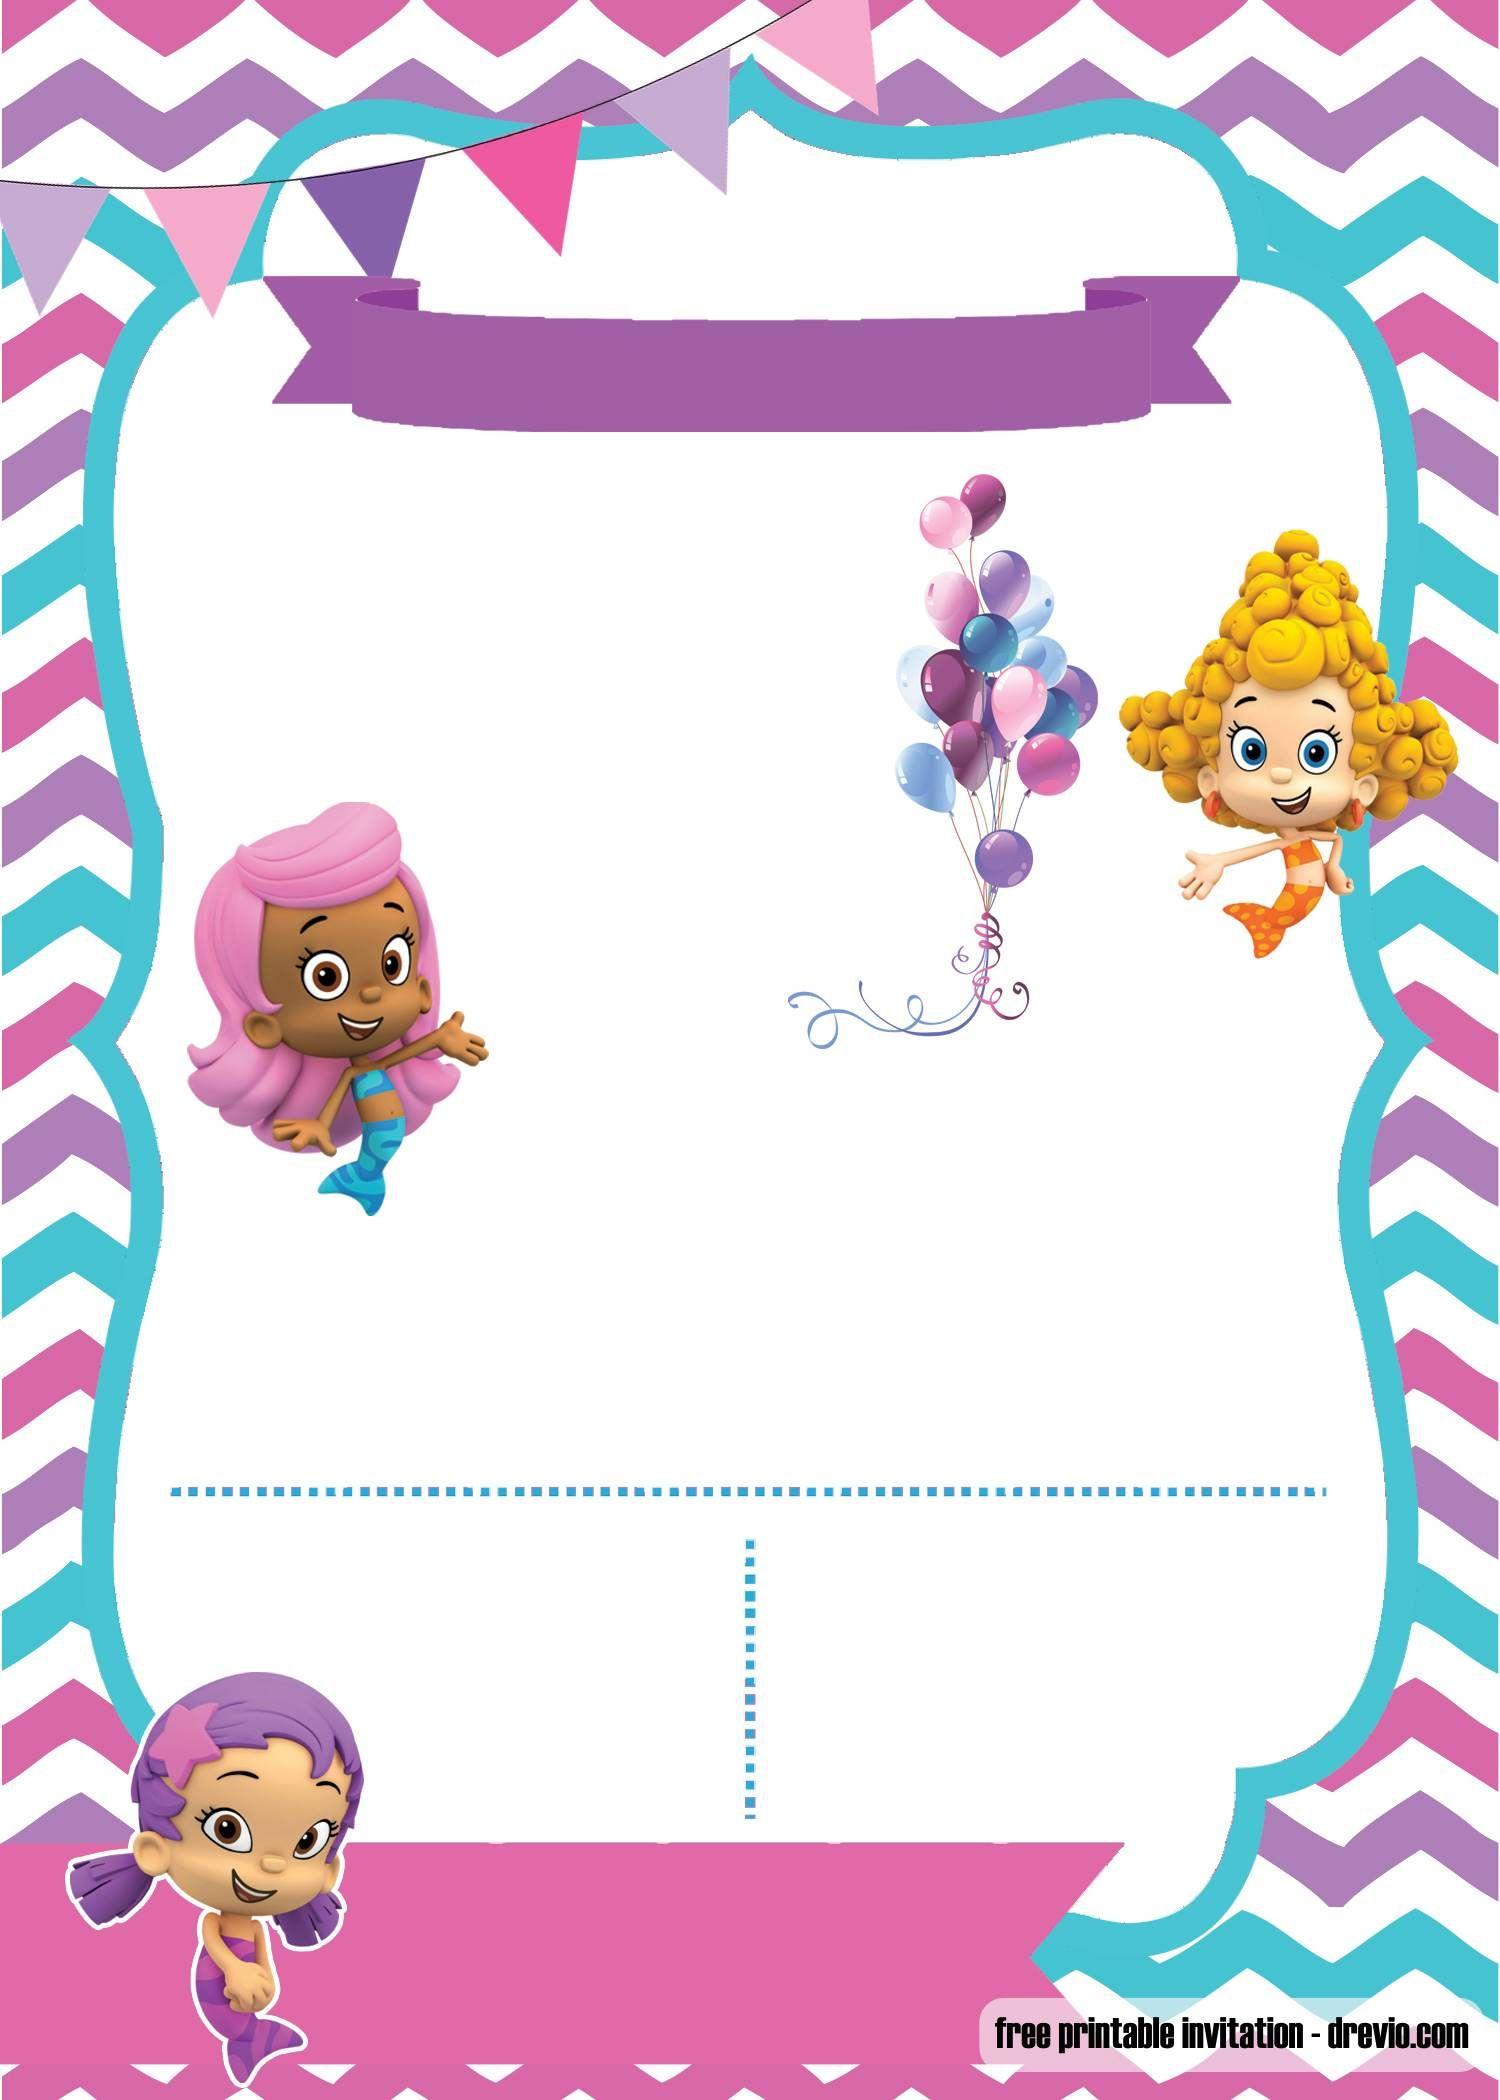 Free Printable Bubble Guppies Invitation Template Drevio Bubble Guppies Invitations Bubble Guppies Birthday Birthday Banner Template